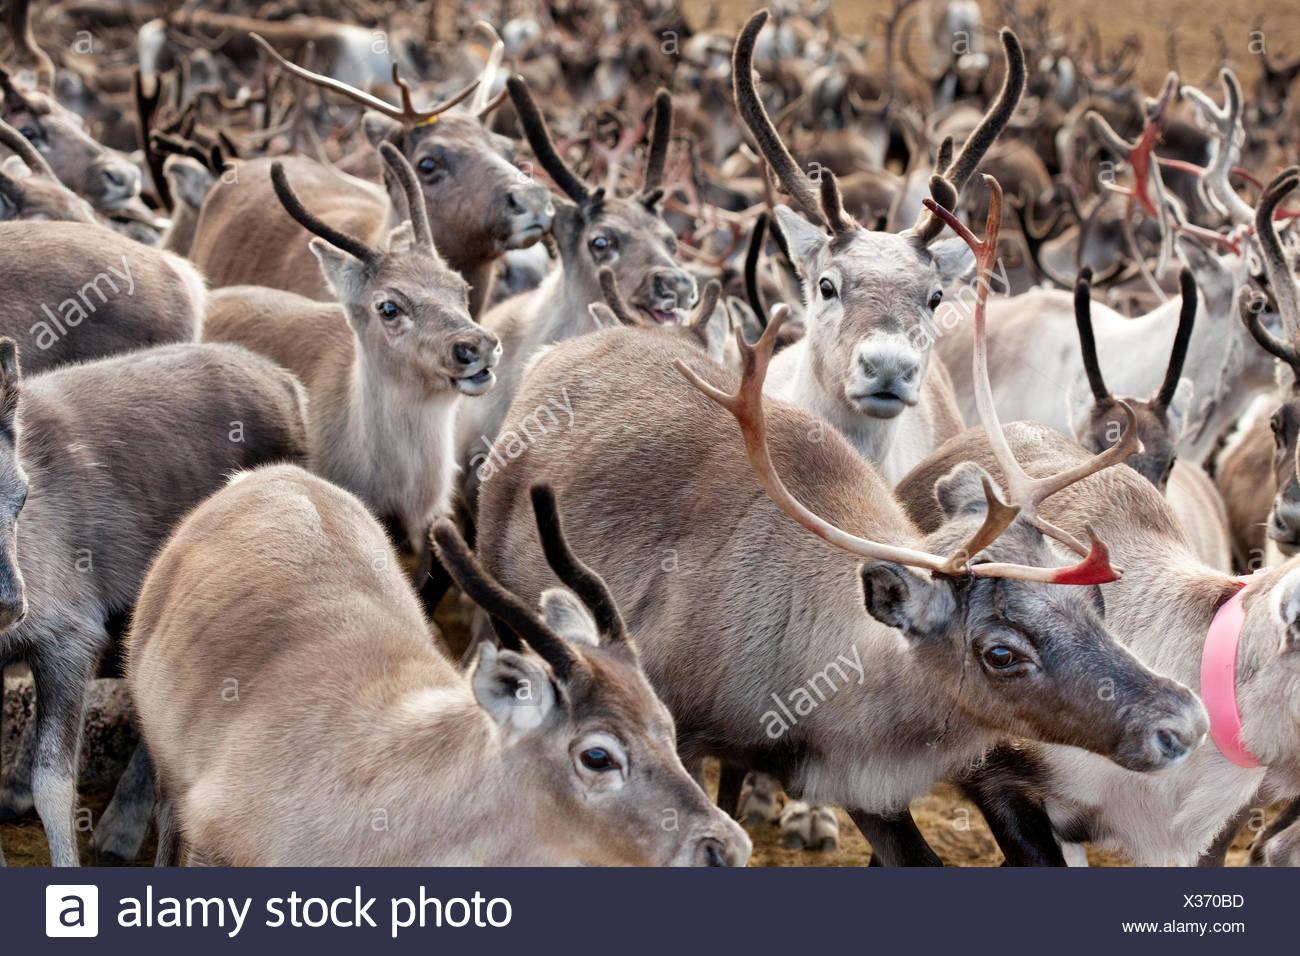 Sweden, Lapland, Levas, Herd of reindeer (Rangifer tarandus) Stock Photo